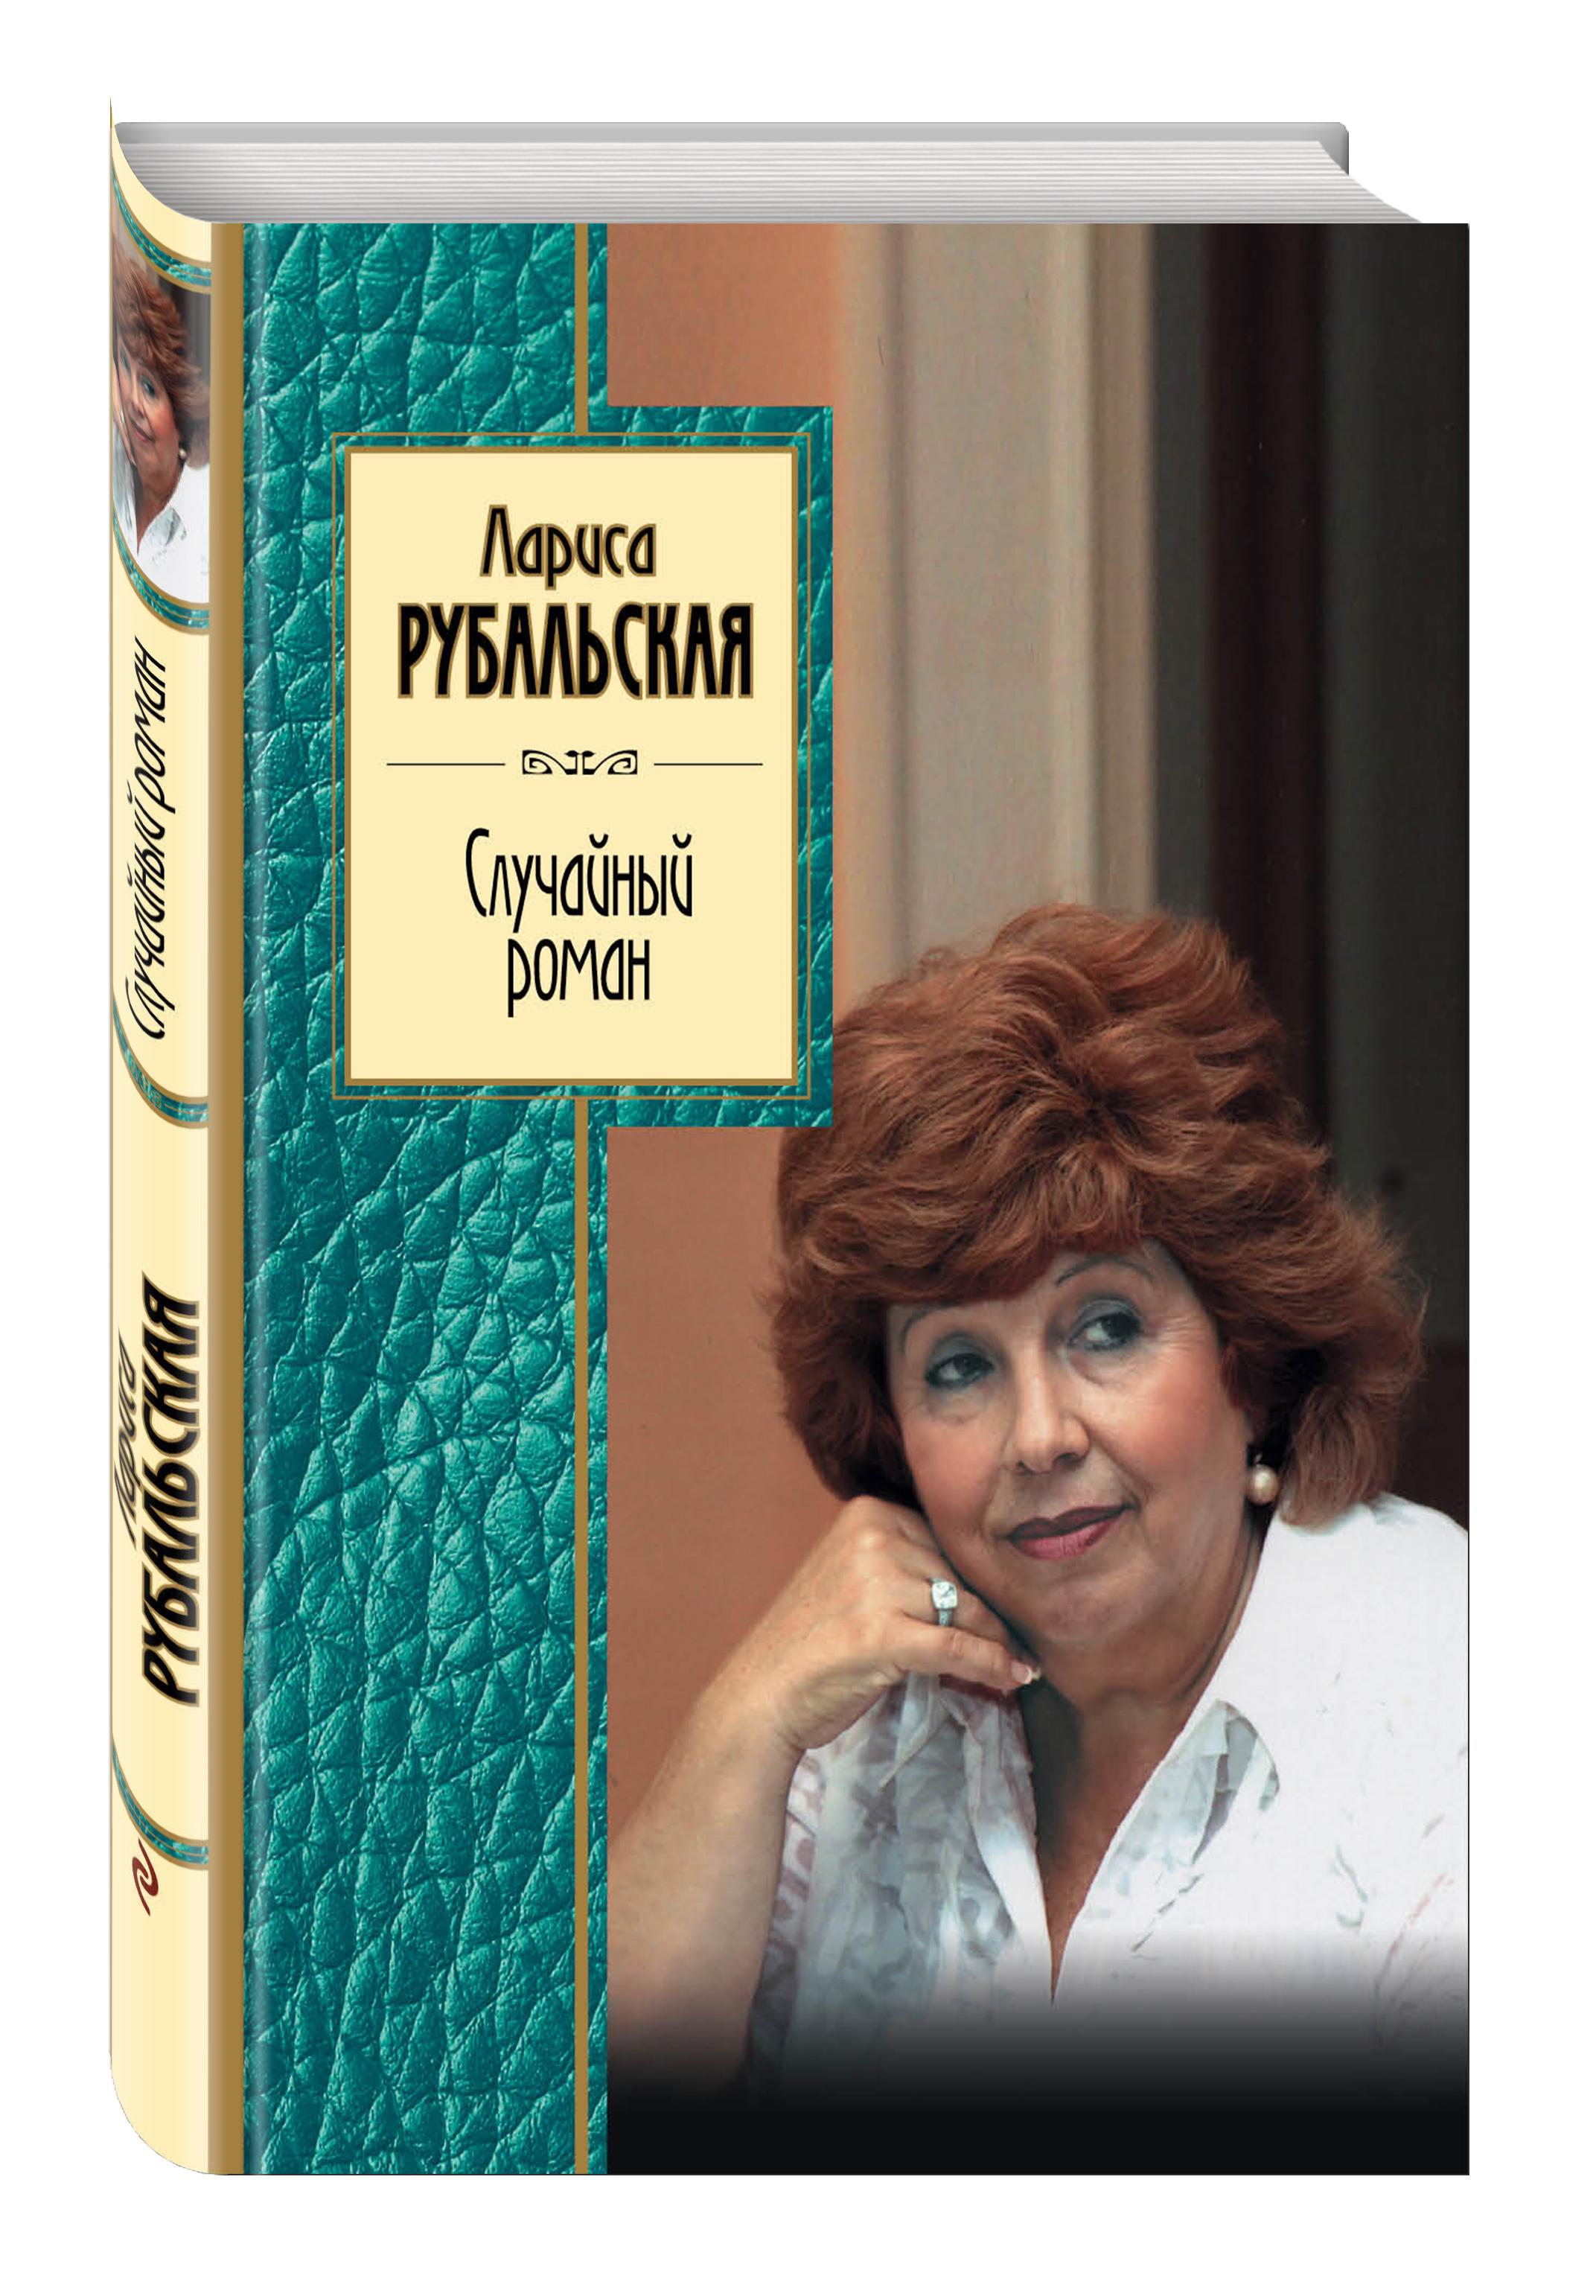 Рубальская Л.А. Случайный роман ISBN: 978-5-699-75167-9